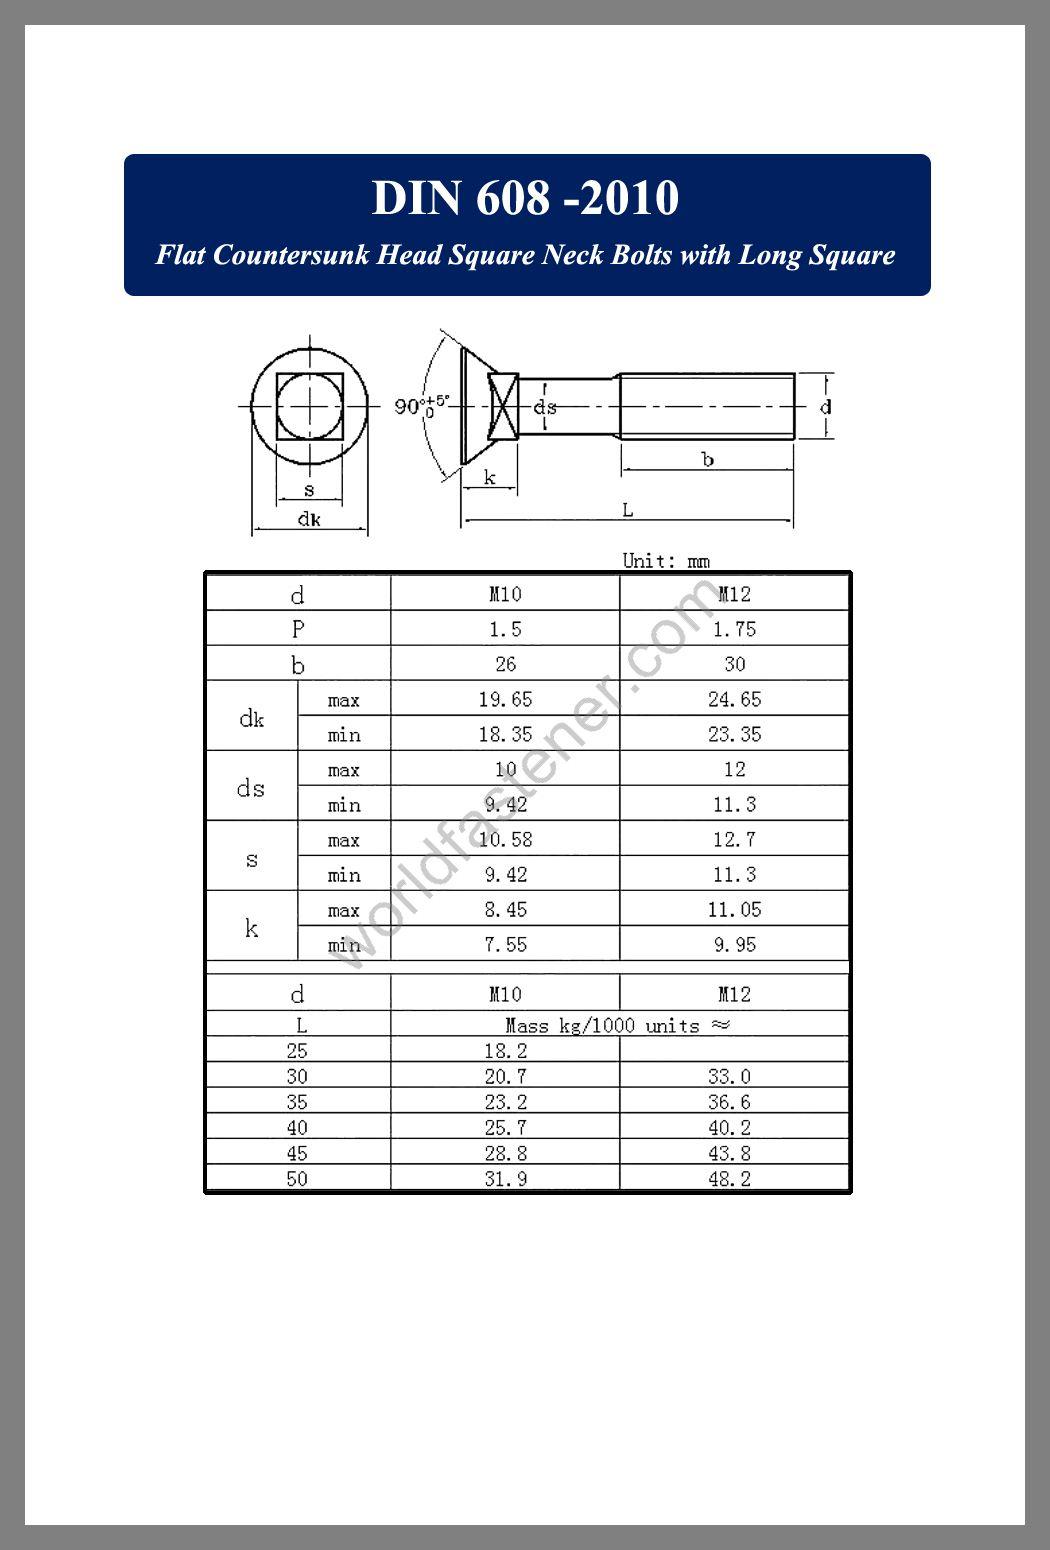 DIN 608 Flat Countersunk Head Square Neck Bolts with Short Square, Countersunk Head Bolts, Countersunk Head Screws, fastener, screw, bolt, din standard bolts, din standard screws